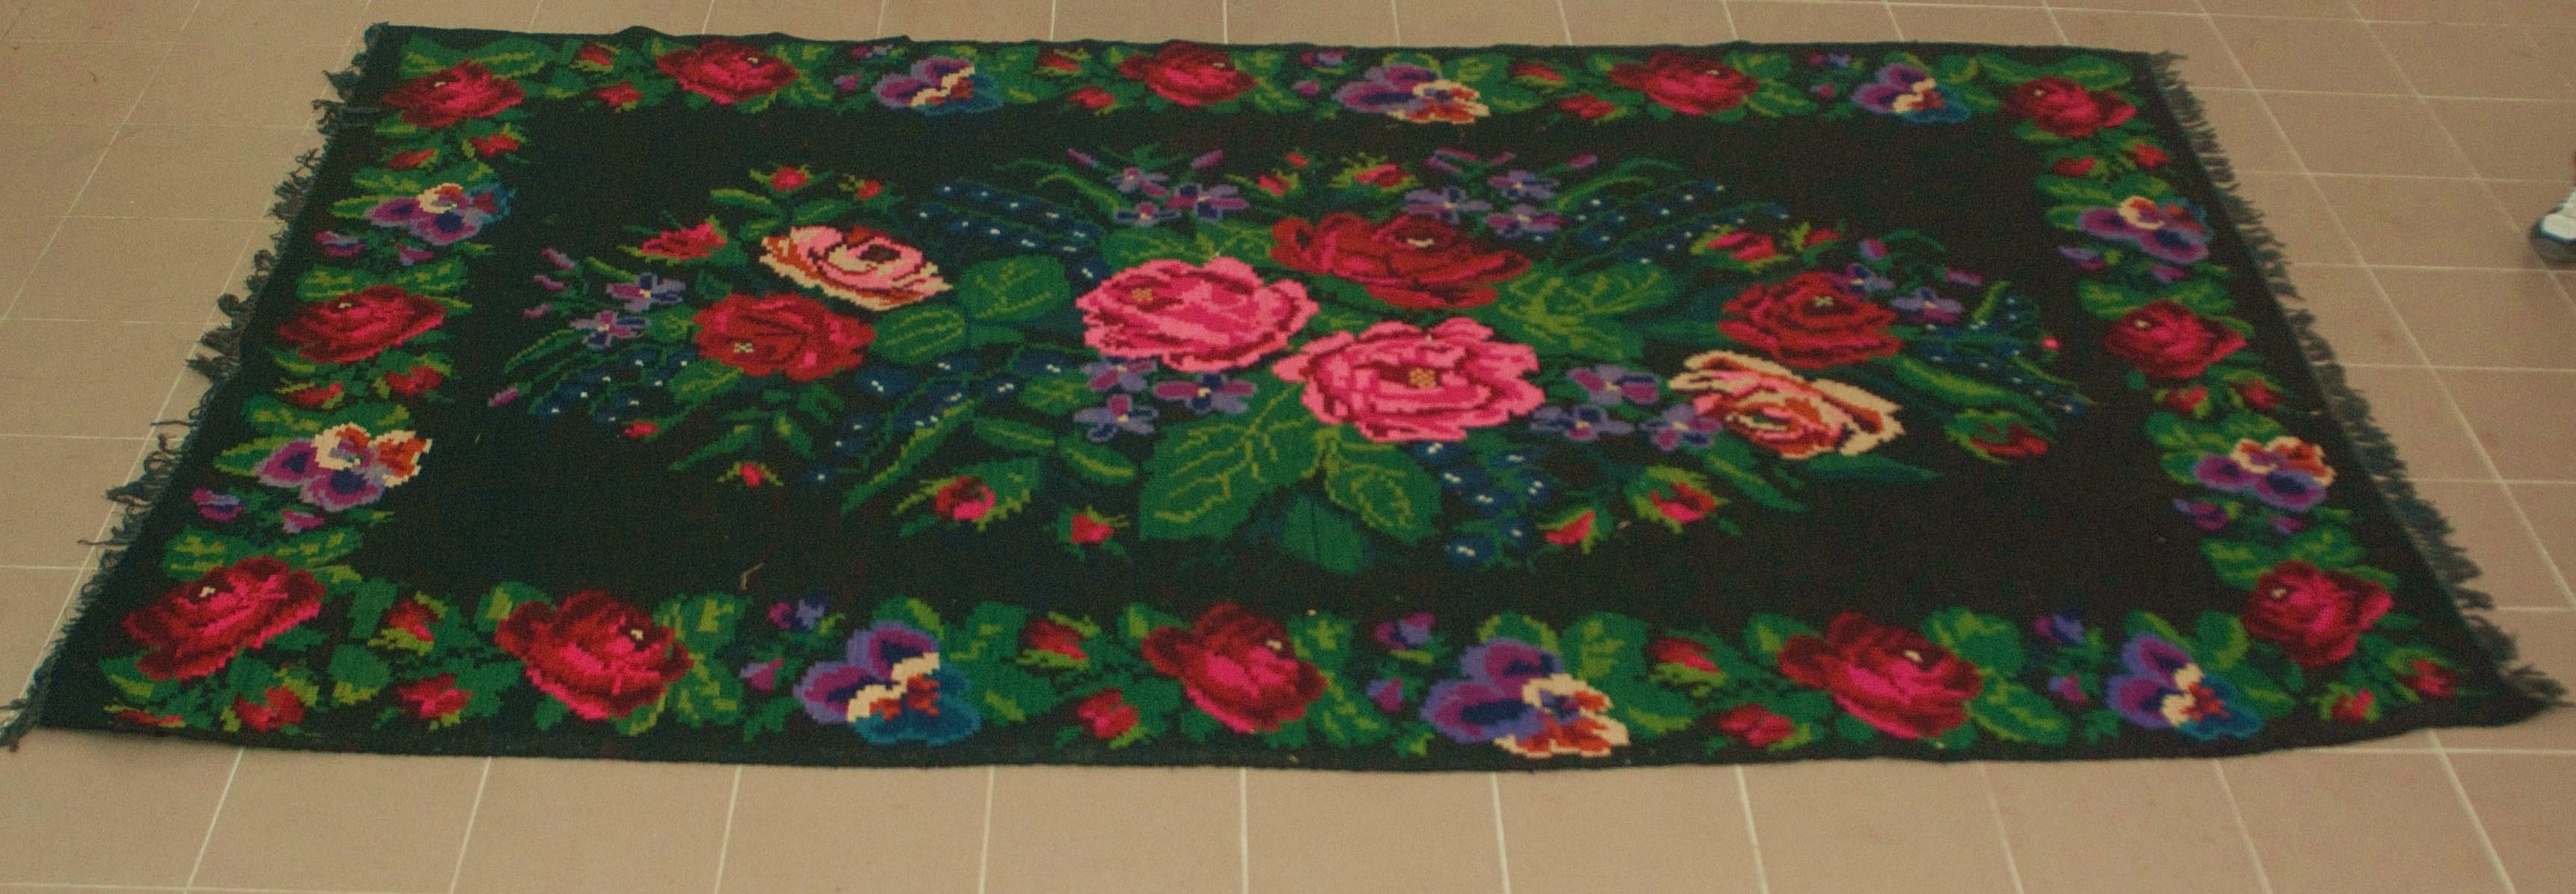 Unieke oude rozenkelim nr 0124 (194cm x 310cm) Kelim wordt begin oktober in Nederland verwacht